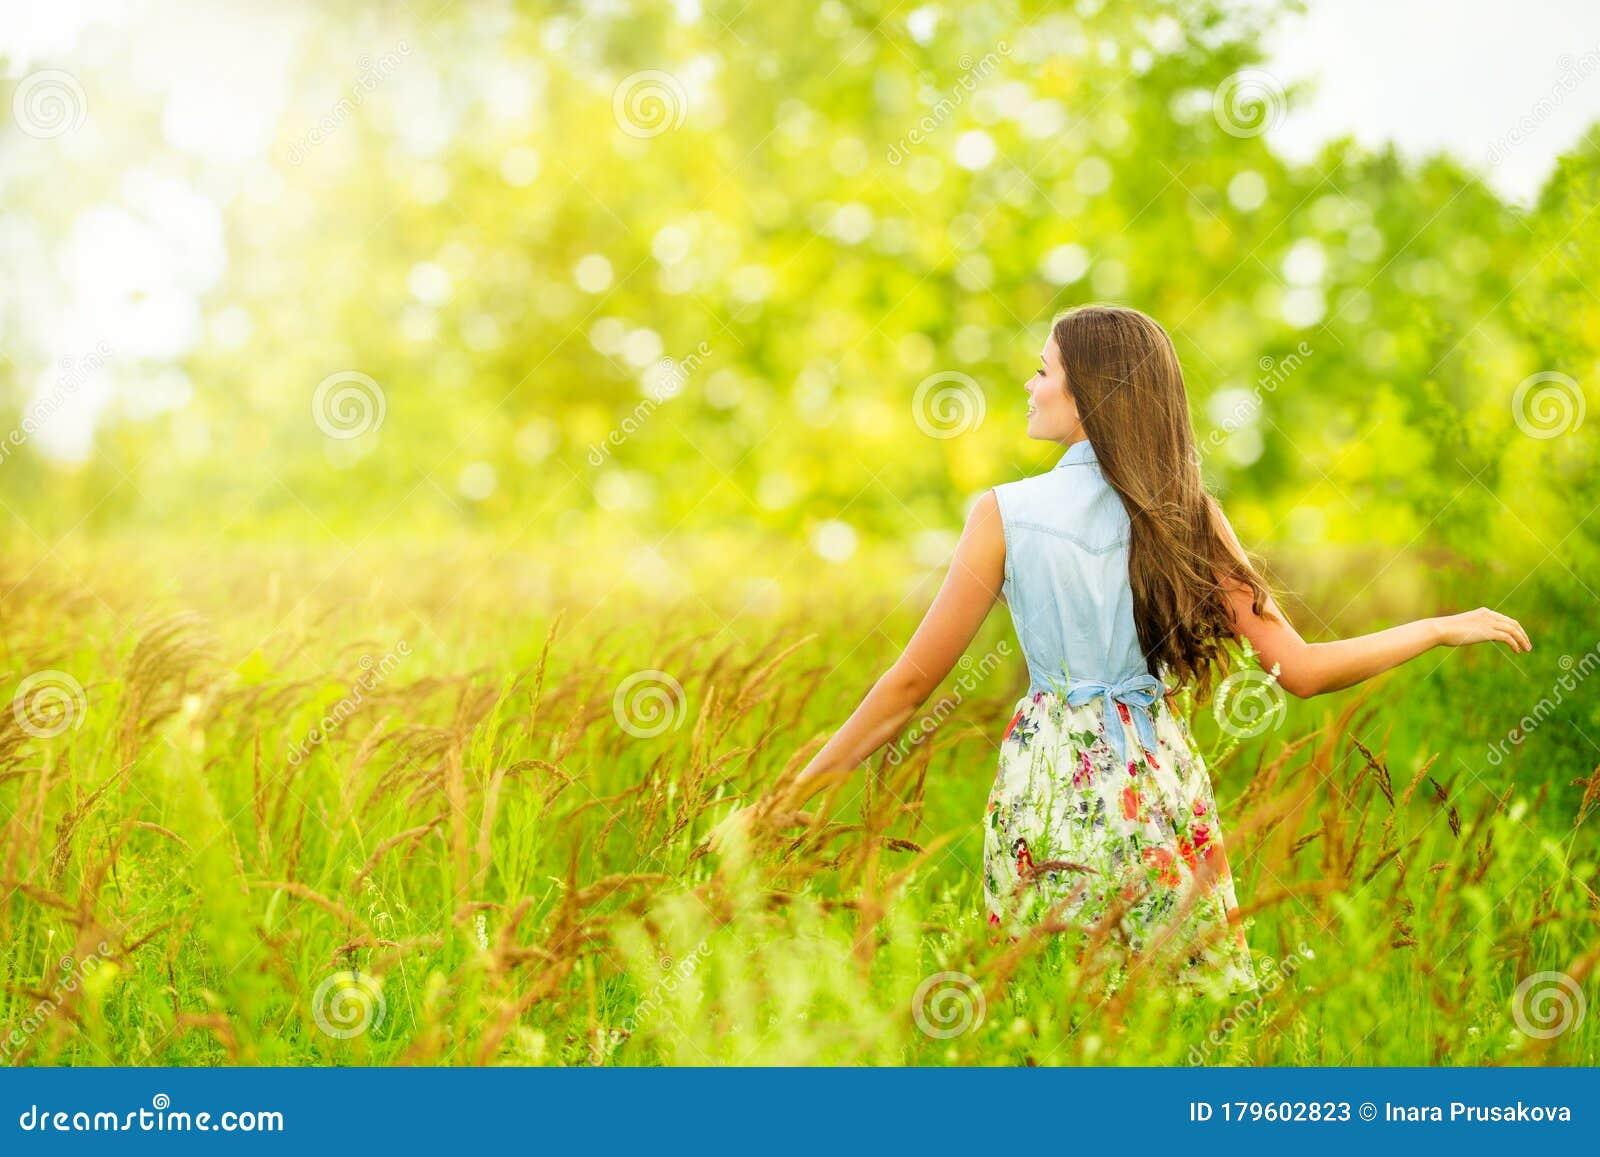 Girl nature Nature Girl